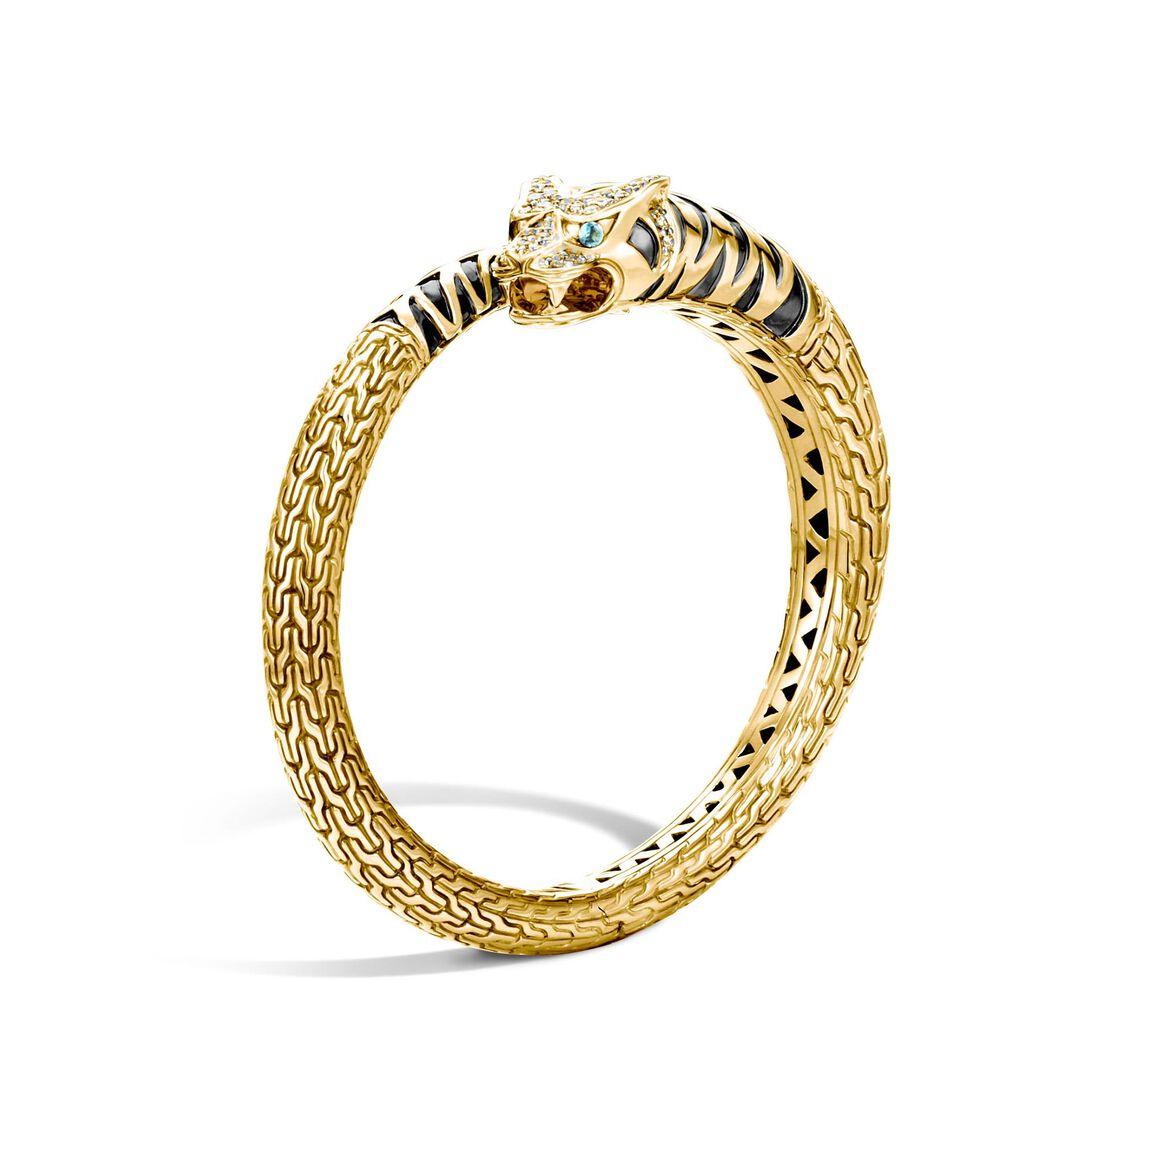 Legends Macan Kick Cuff in 18K Gold with Diamonds